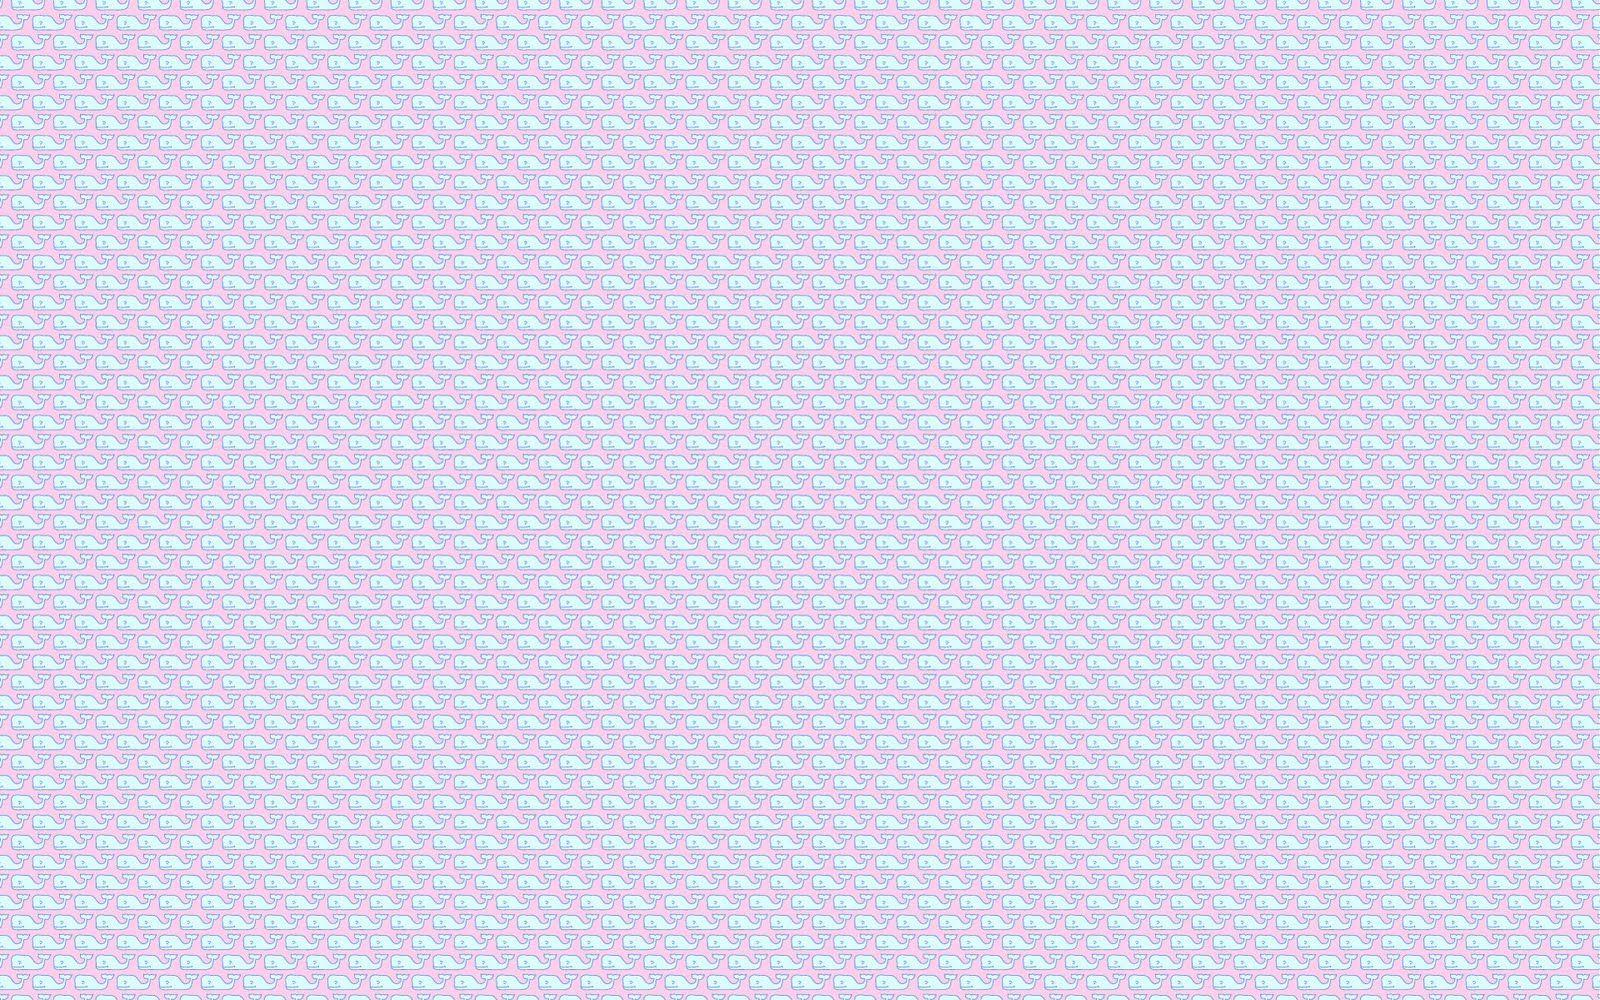 CanadianPrep Vineyard Vines Wallpaper Wallpaper Vineyard vines 1600x1000